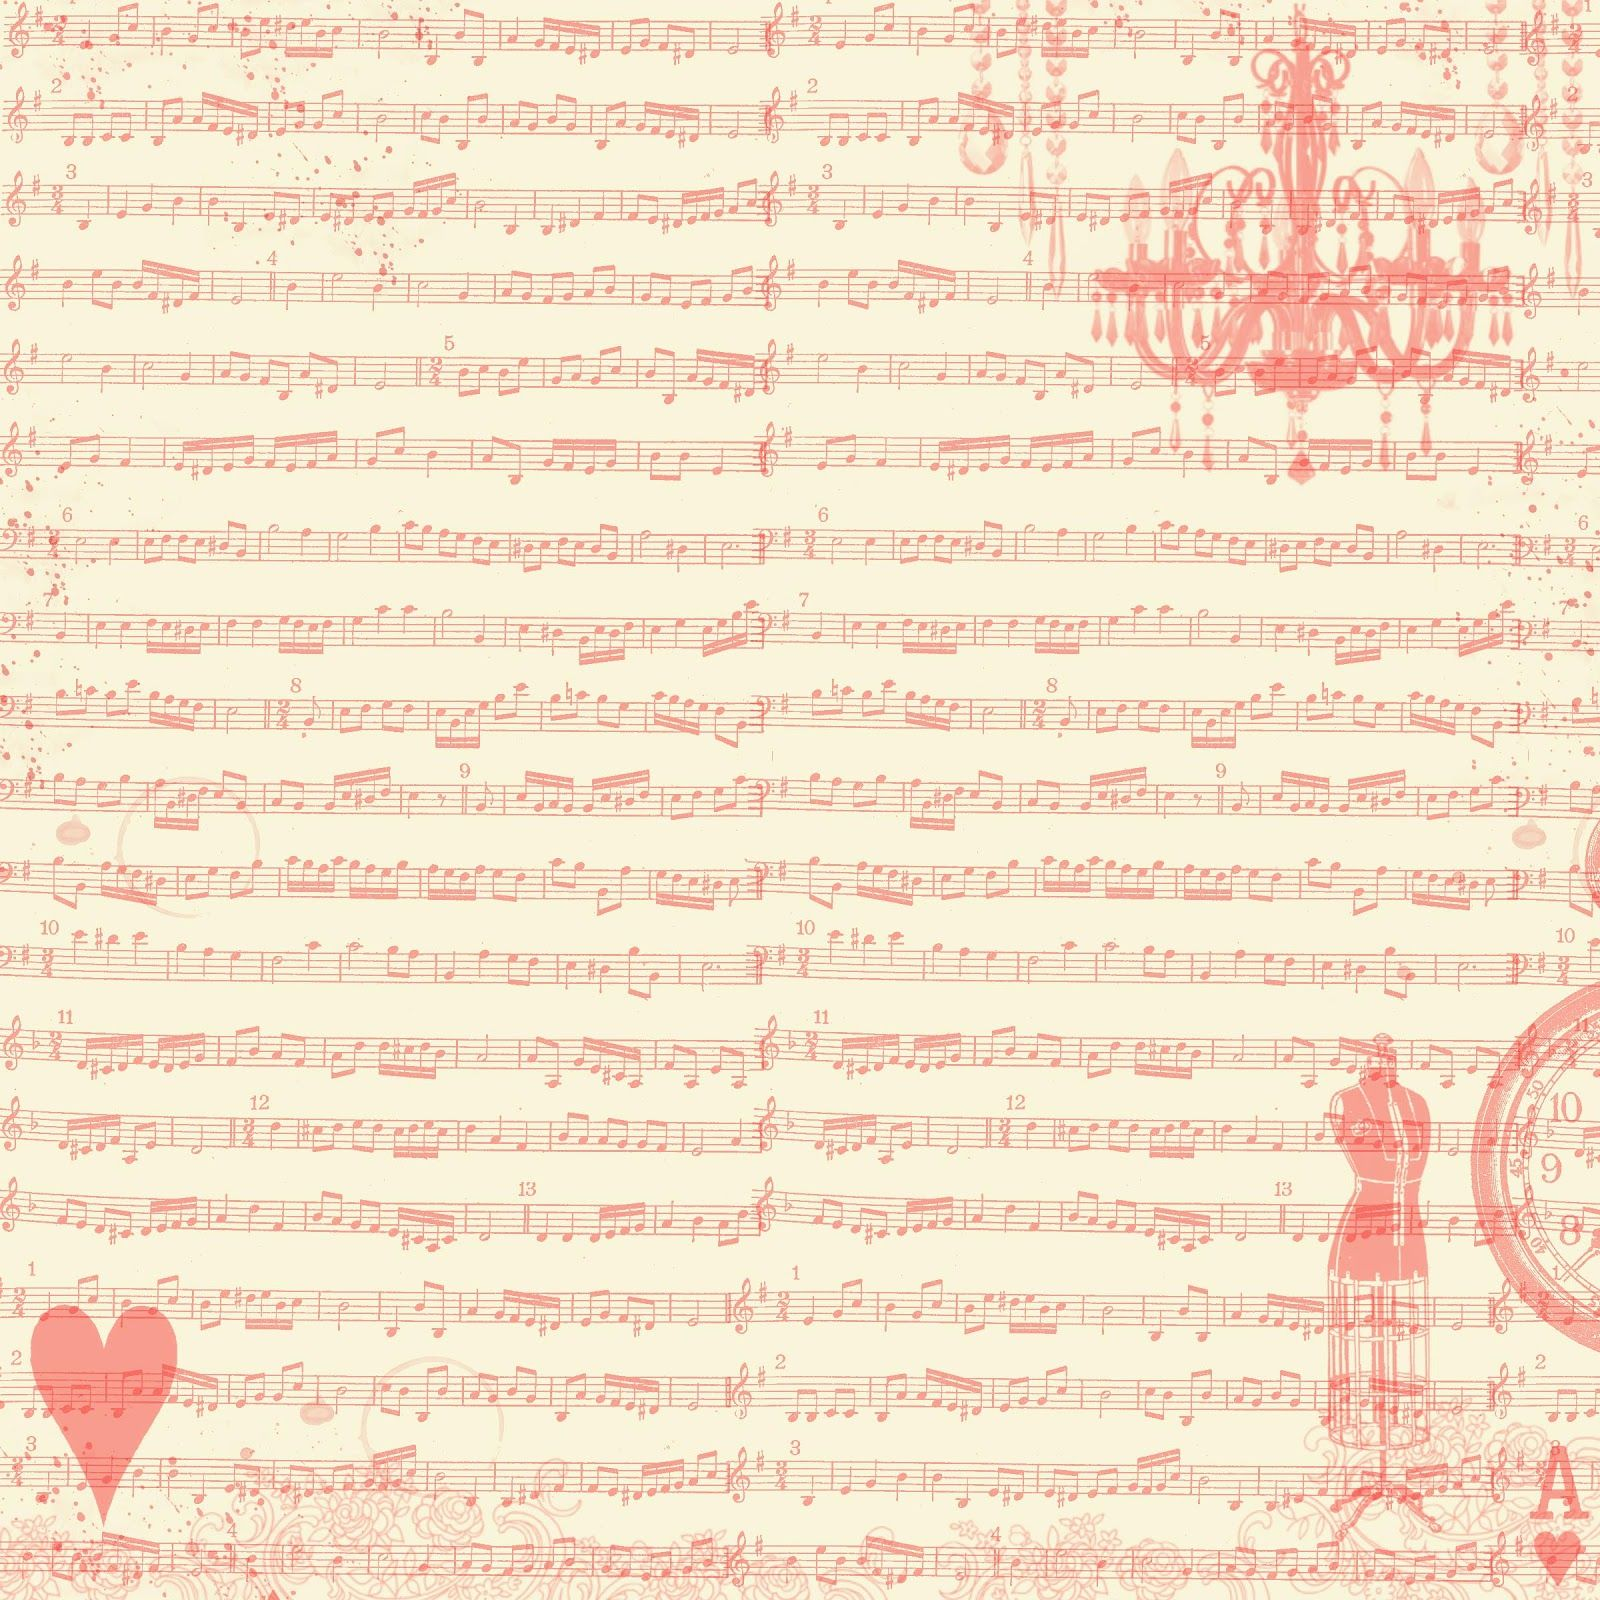 **FREE ViNTaGE DiGiTaL STaMPS**: Free Digital Scrapbook Paper - Sheet Music Collage